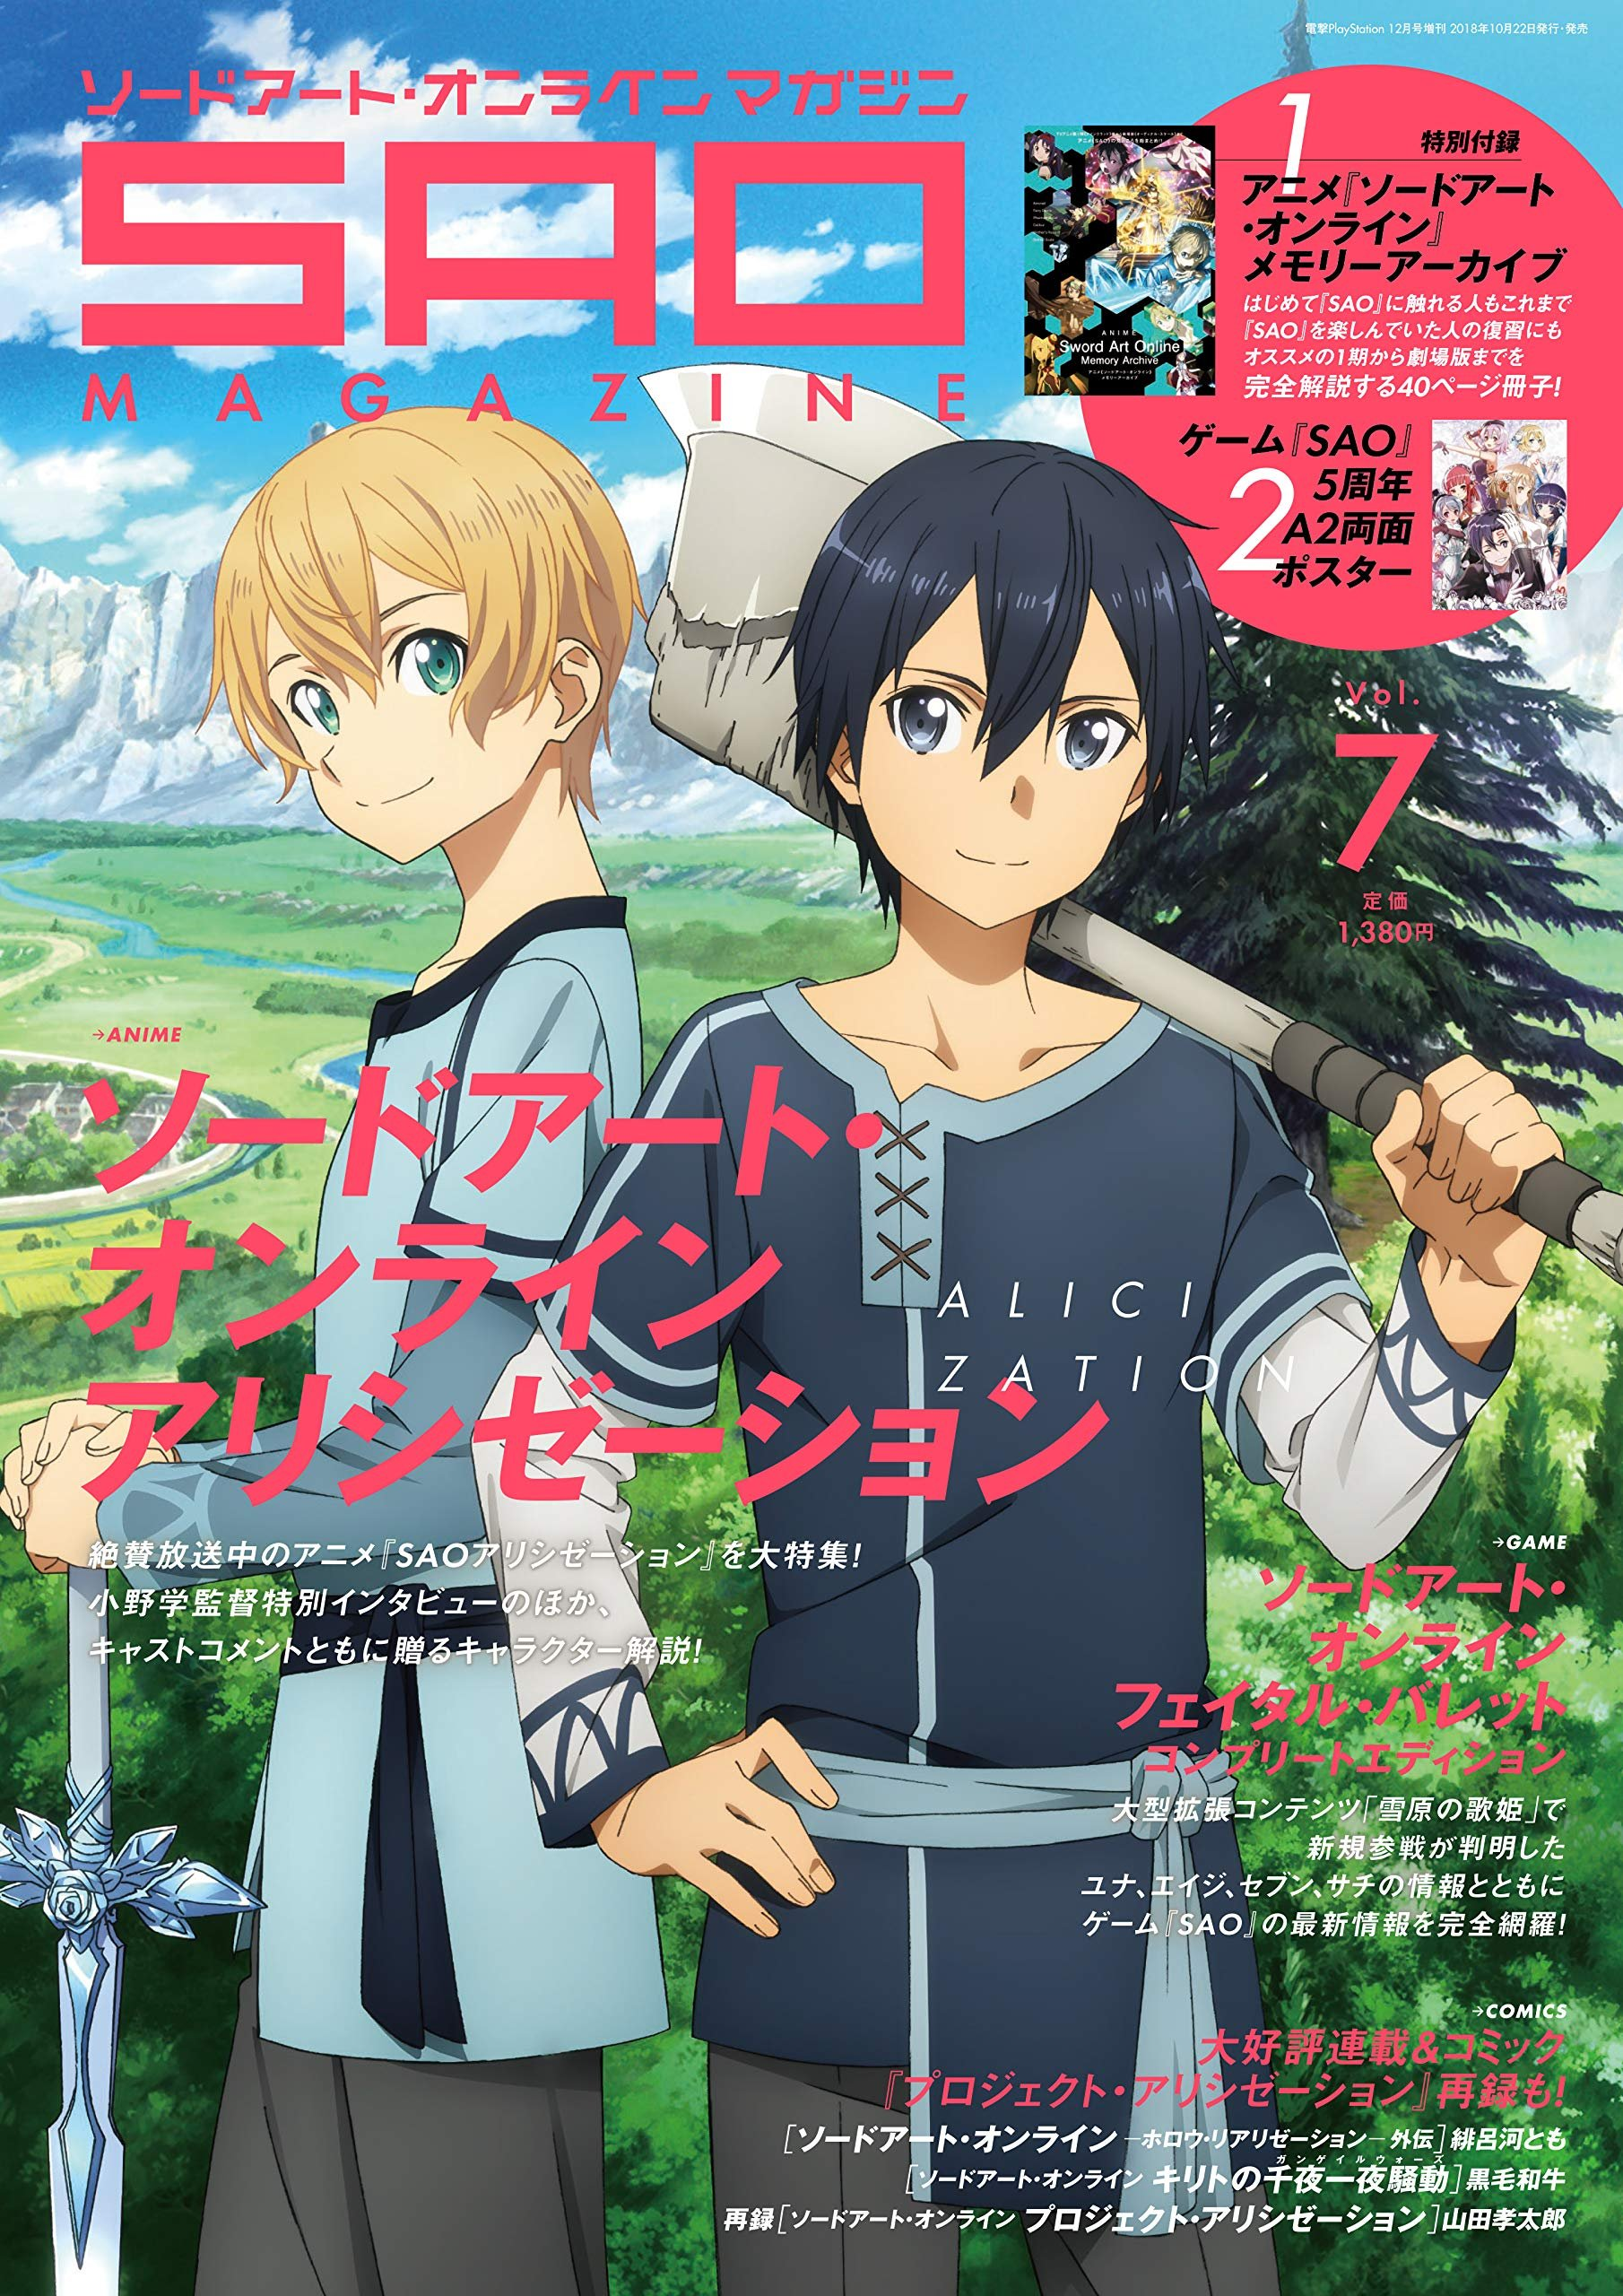 Sword Art Online Magazine Vol.07 (December 2018)